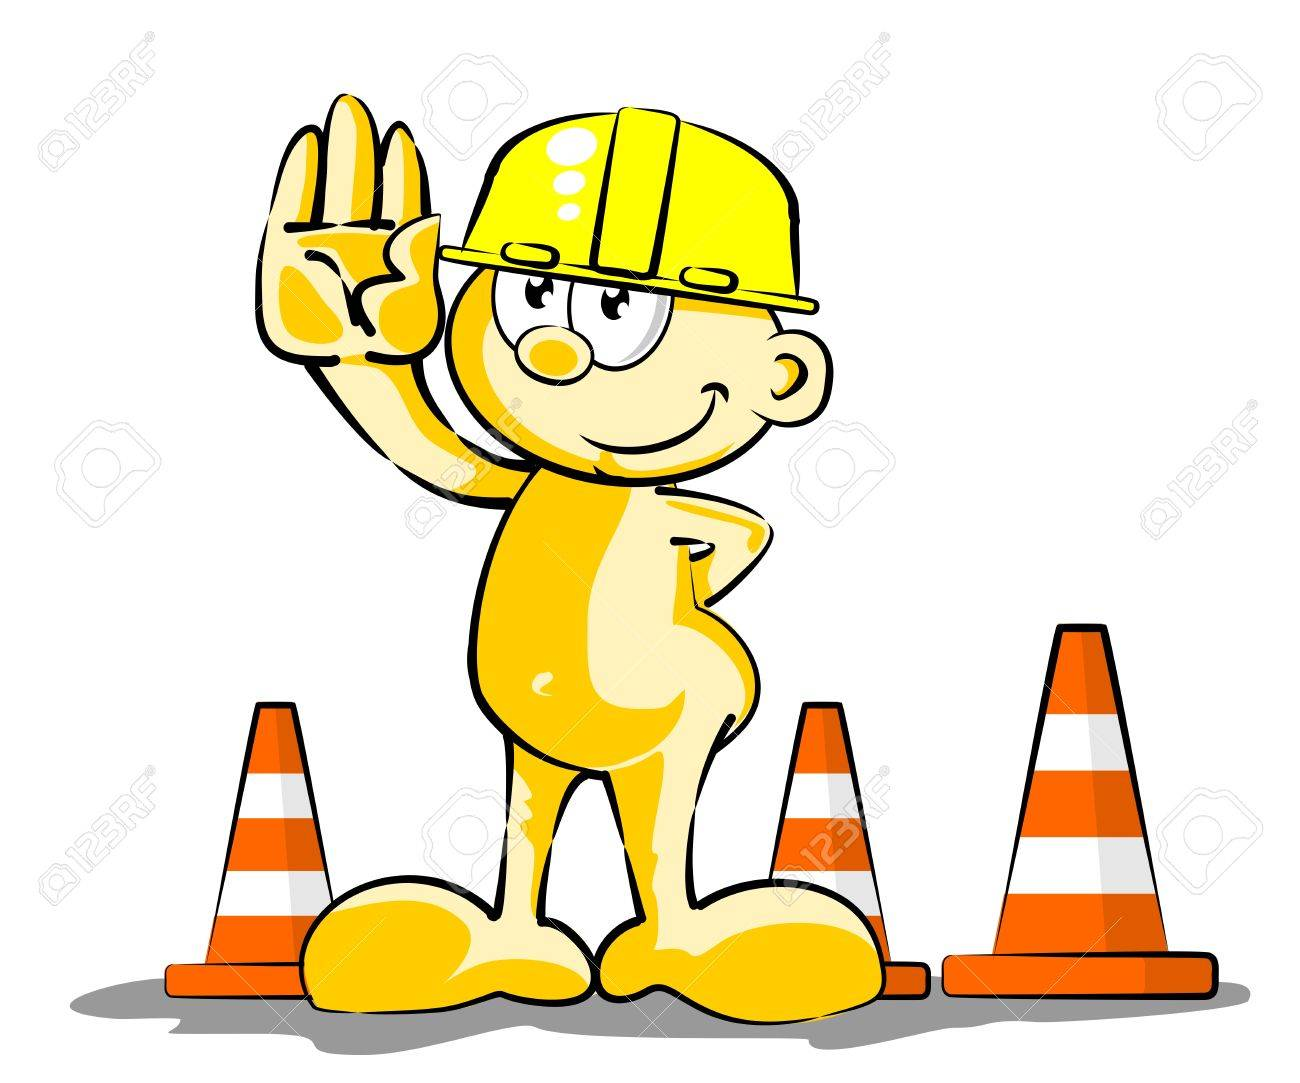 Conceptual illustration, man at a stop pose Stock Vector - 21458018